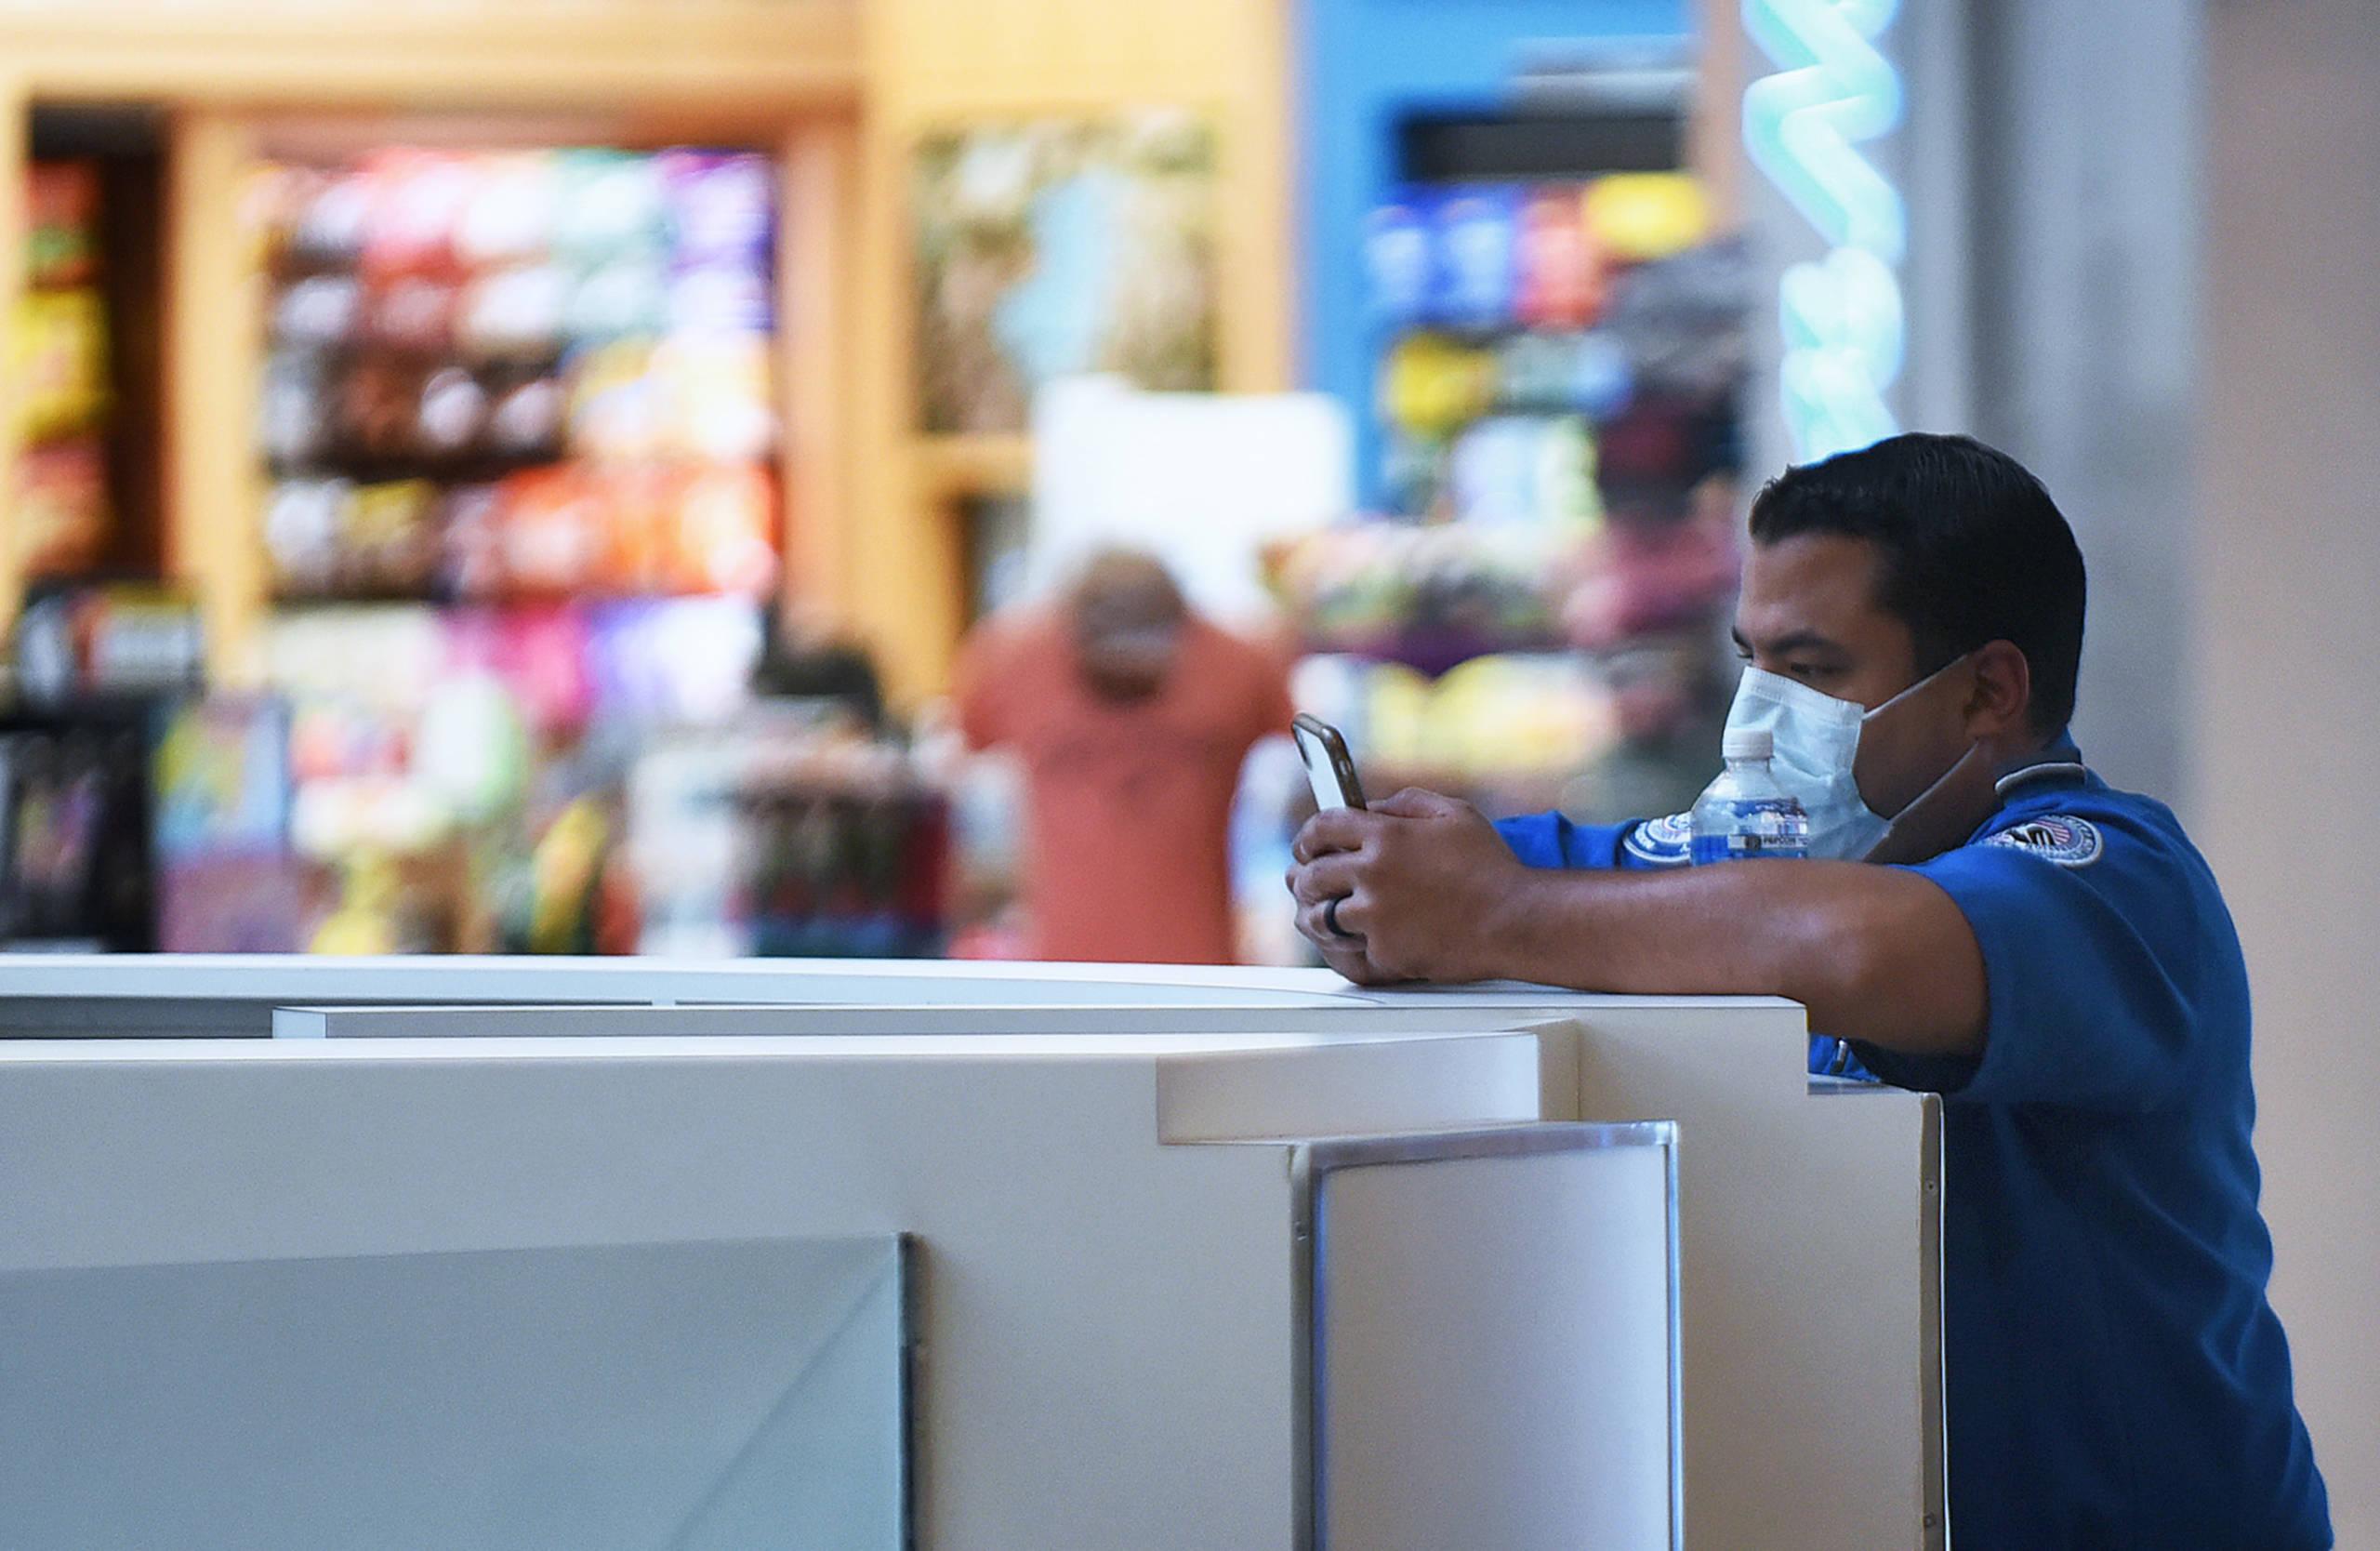 New record low: TSA screens fewer than 100,000 travelers